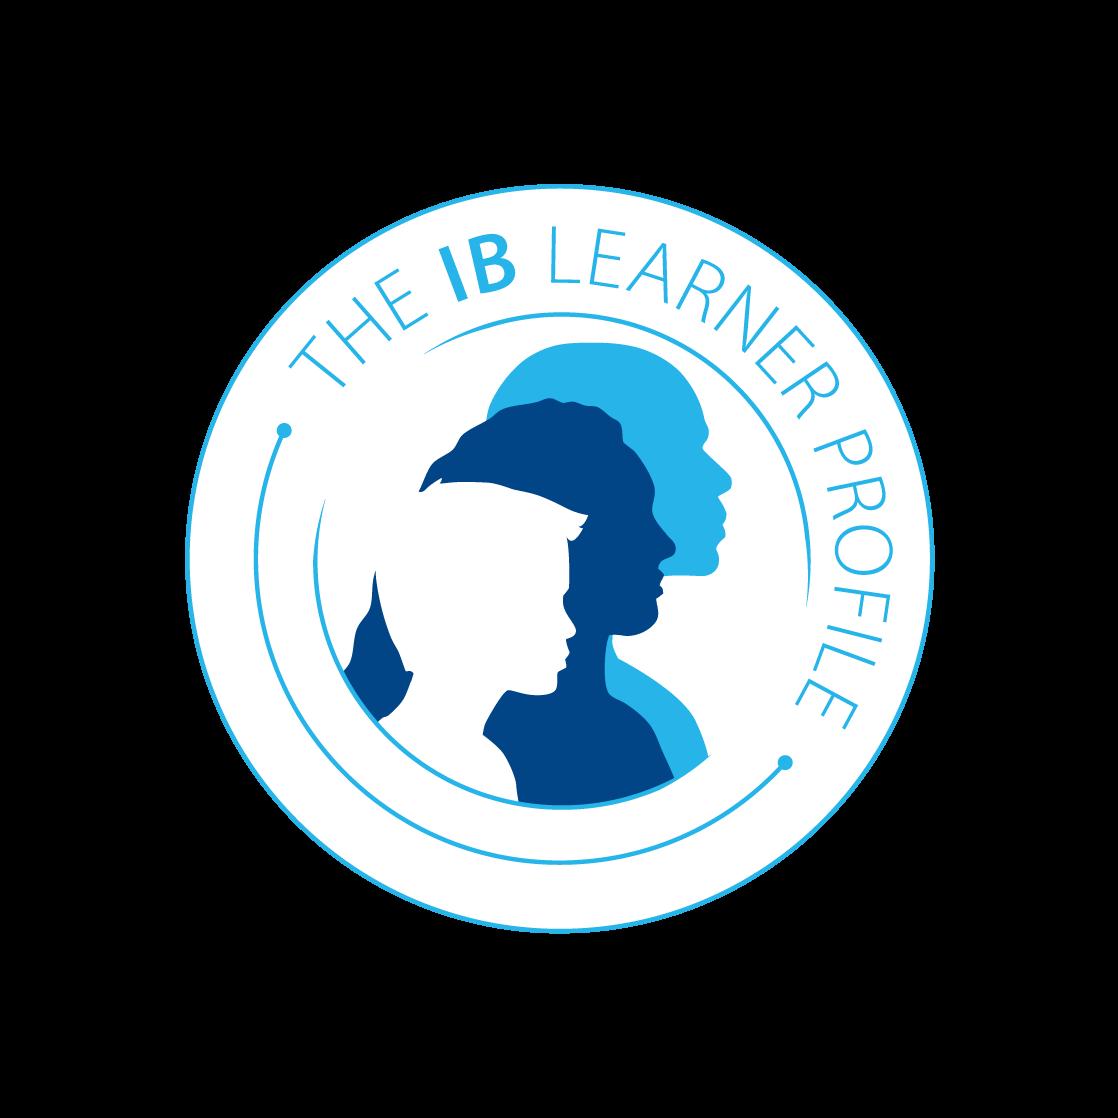 About International Baccalaureate – UPBEATインターナショナル